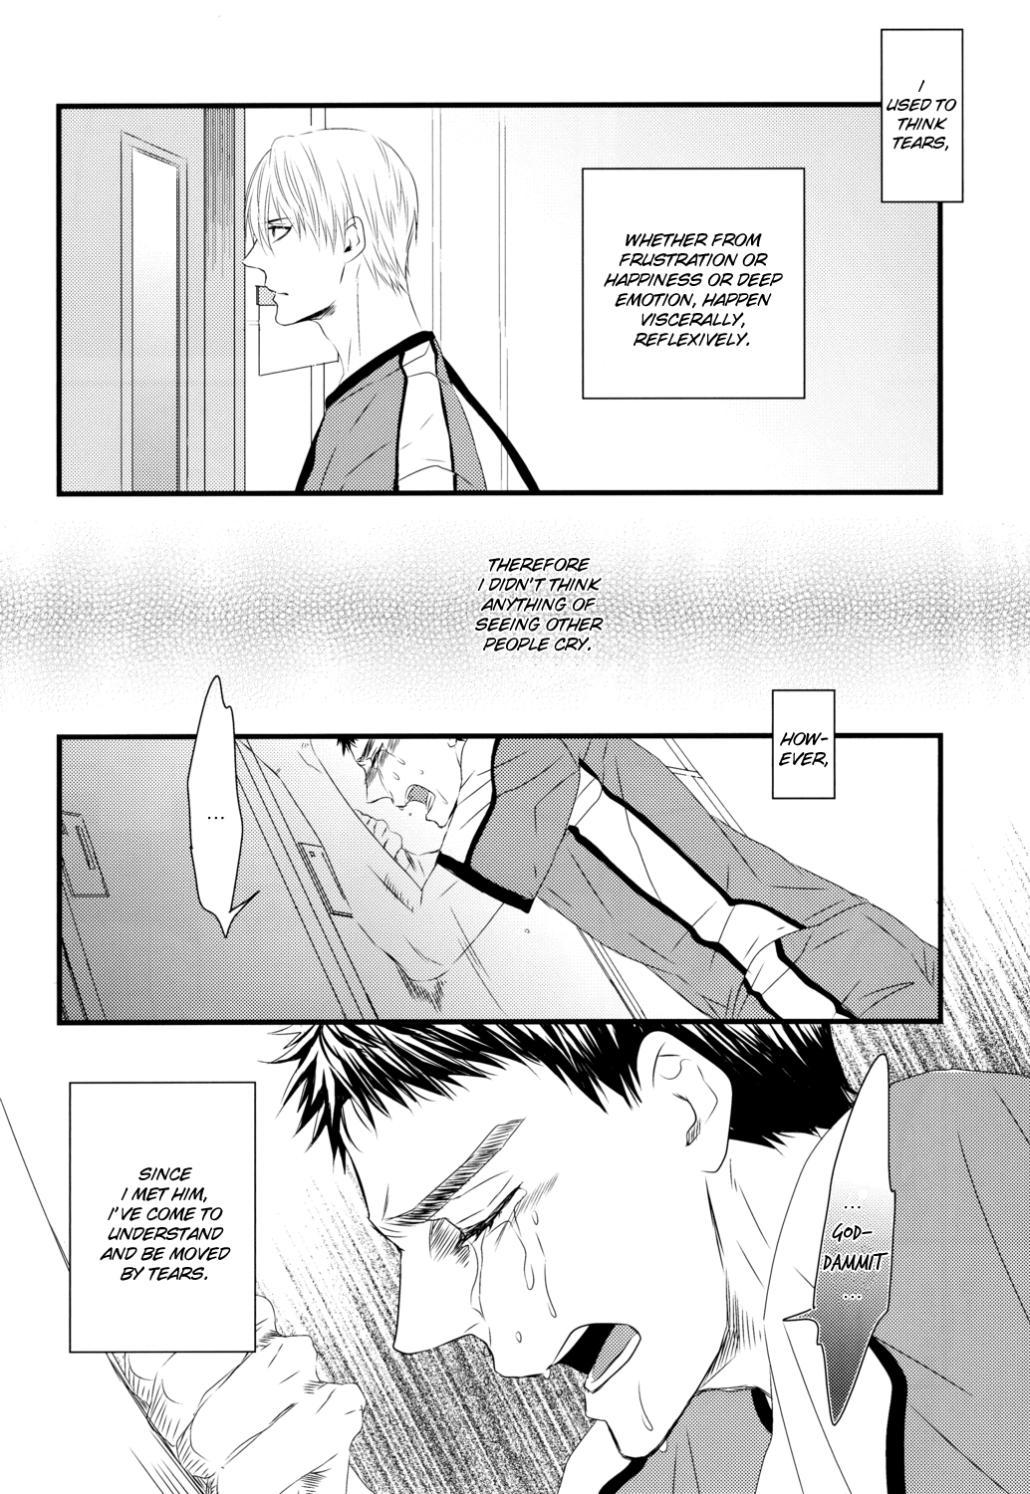 Soshite Boku wa Kirei no Imi o Shiru | And I Know the Meaning of the Beautiful 6